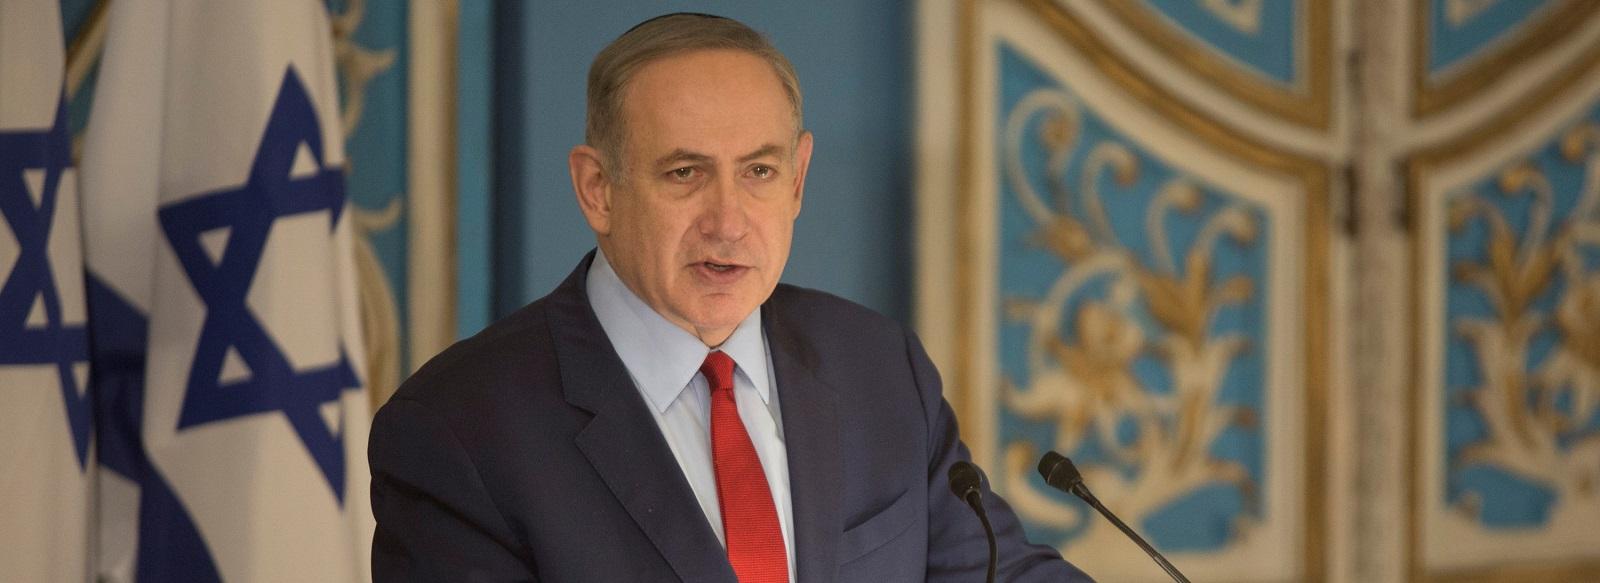 Israel's Prime Minister Benjamin Netanyahu in Jerusalem last month (Photo: Lior Mizrahi/Getty Images)